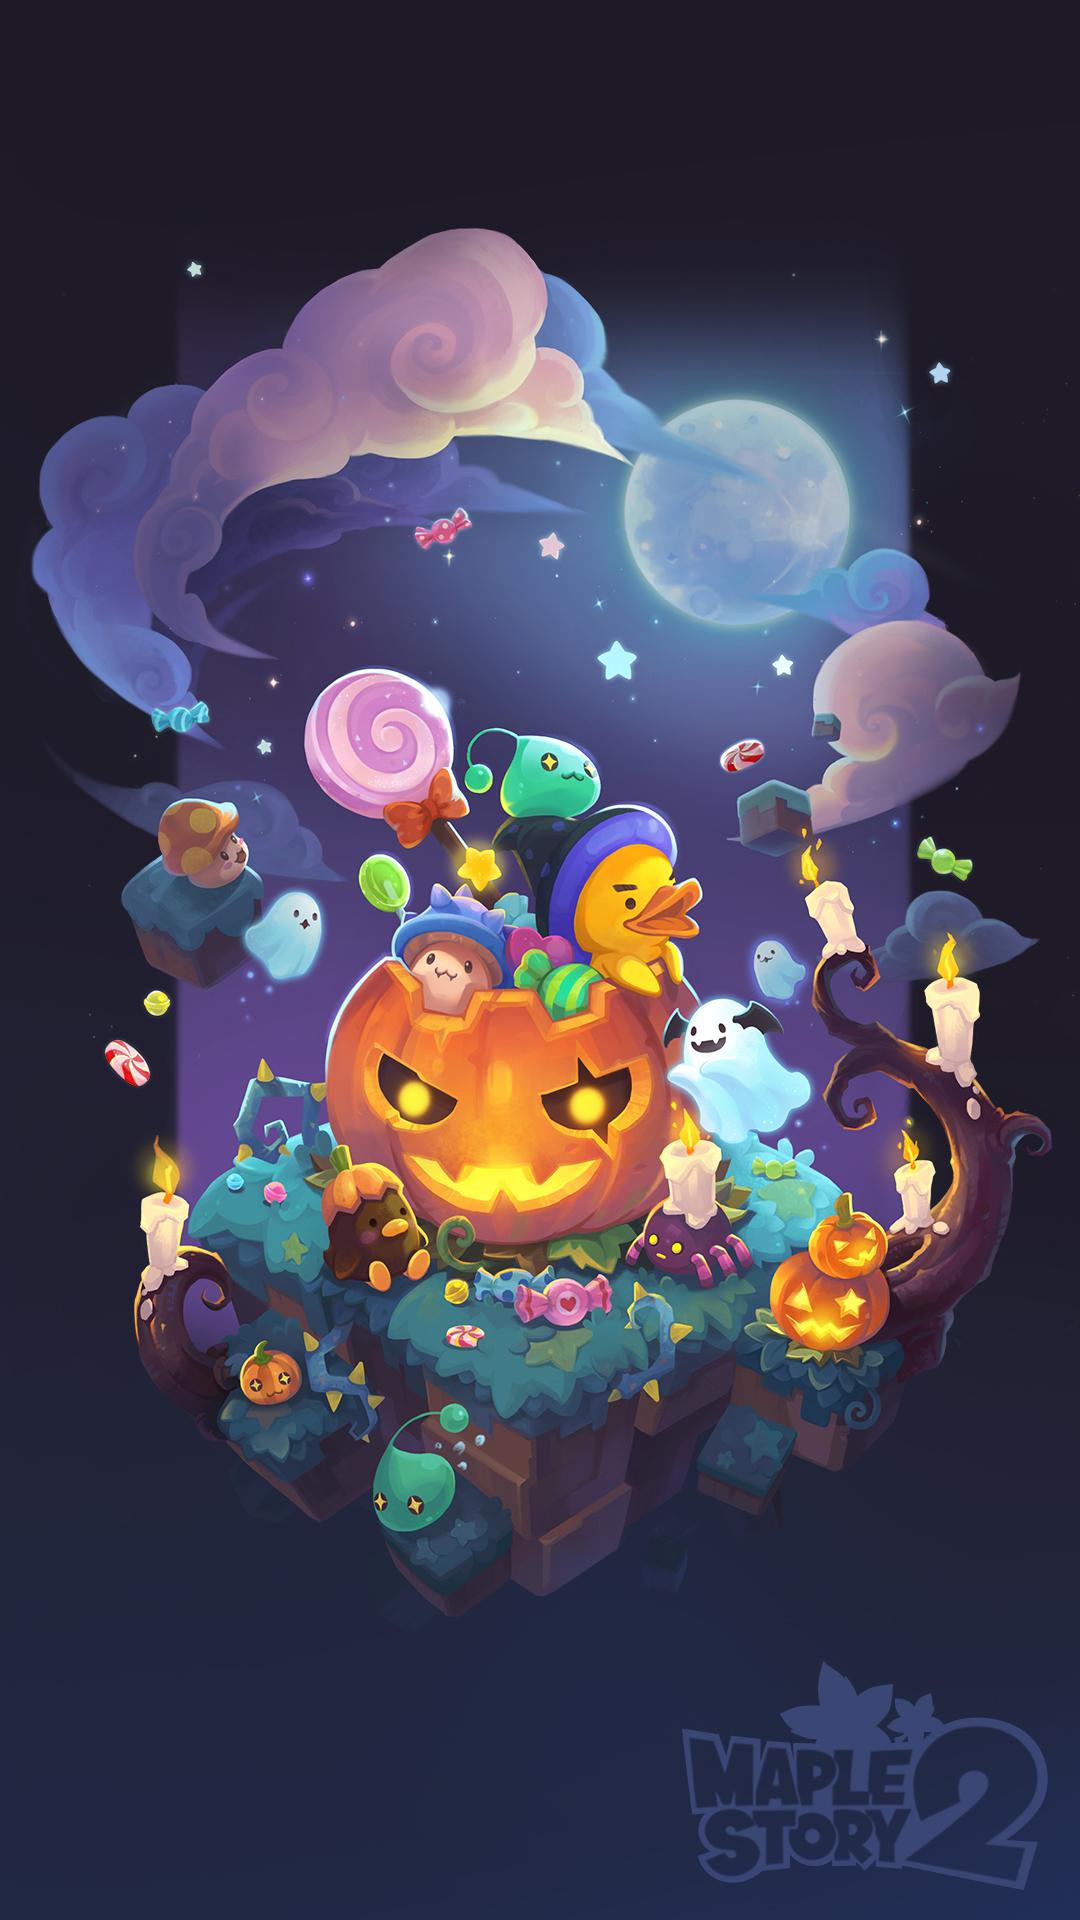 Halloween Wallpaper Official MapleStory 2 Website 1080x1920